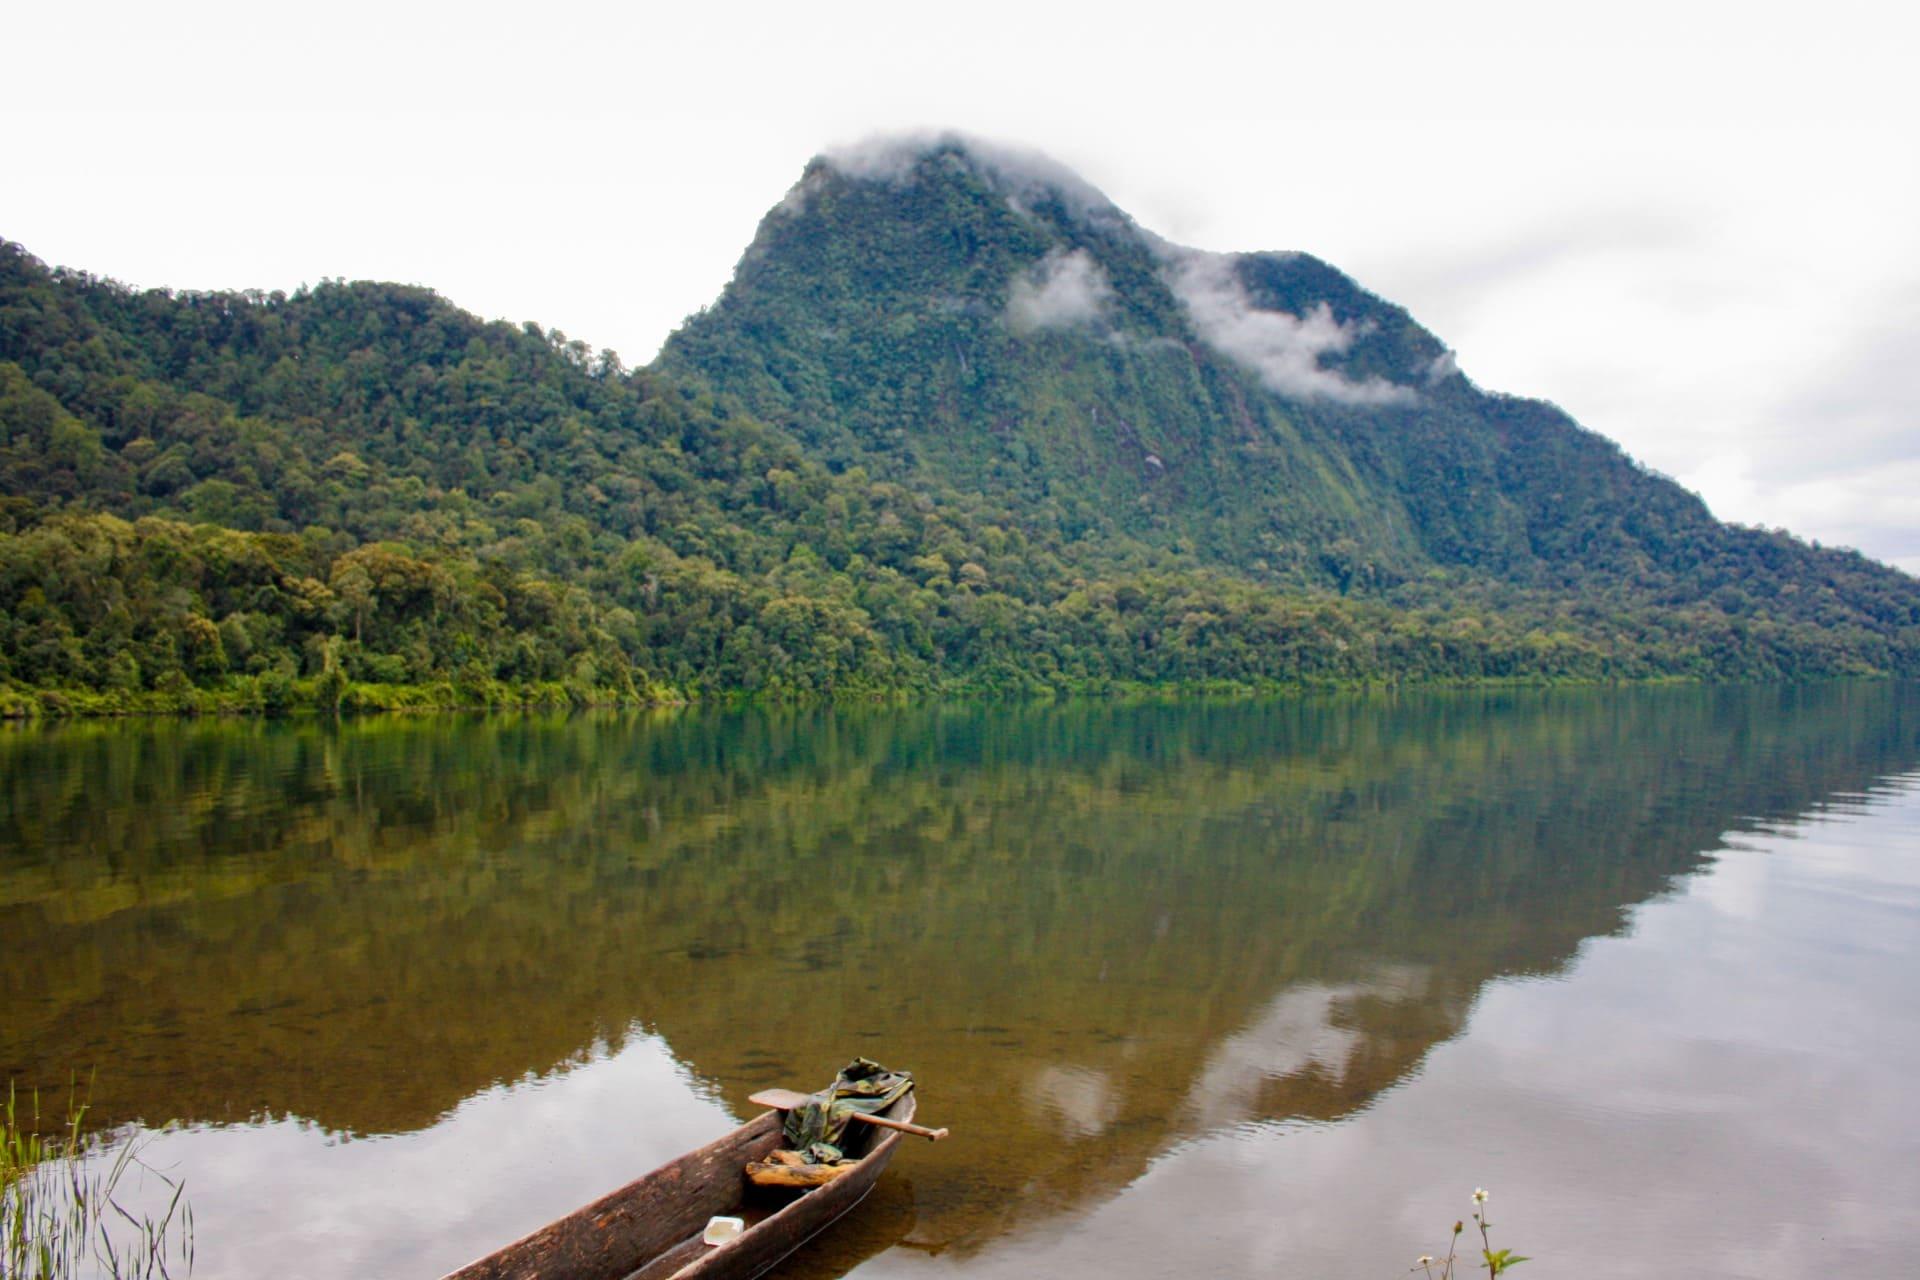 Pasir Putih, Mt. Tujuh Lake, Gunung Tujuh, Kerinci, Sumatra, Indonesia